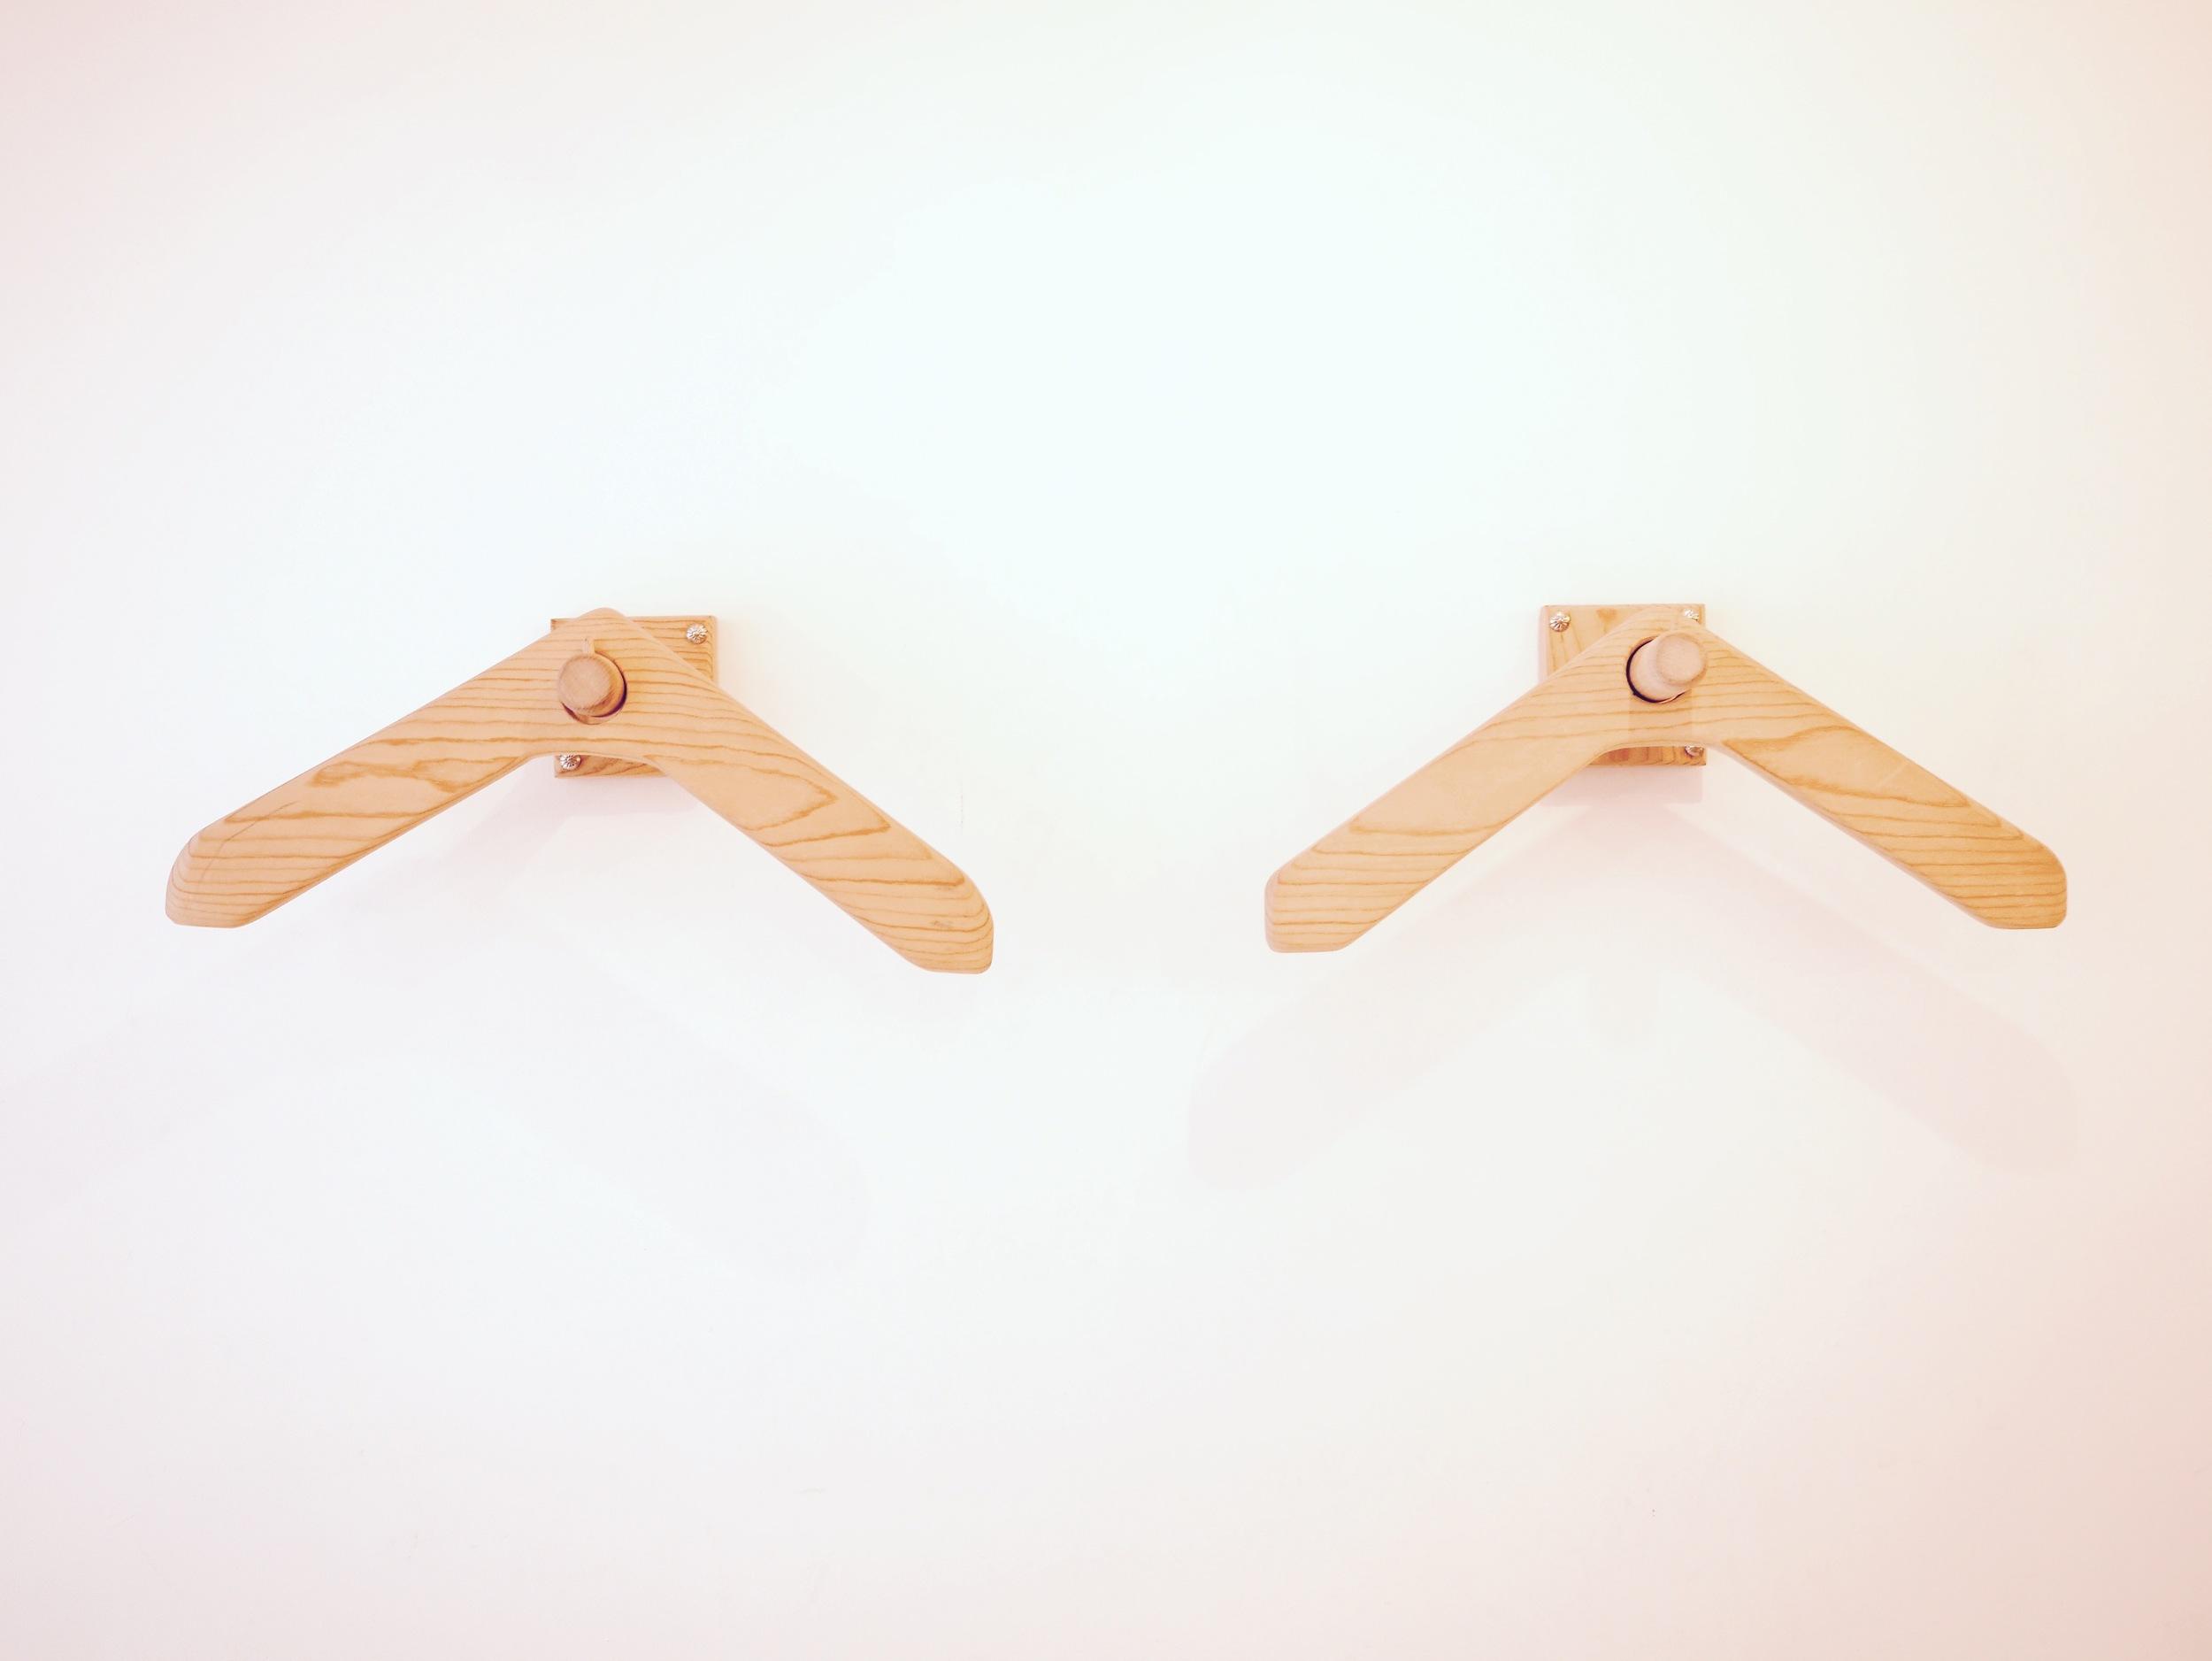 Wooden Wall Hangers by Non Matsuura